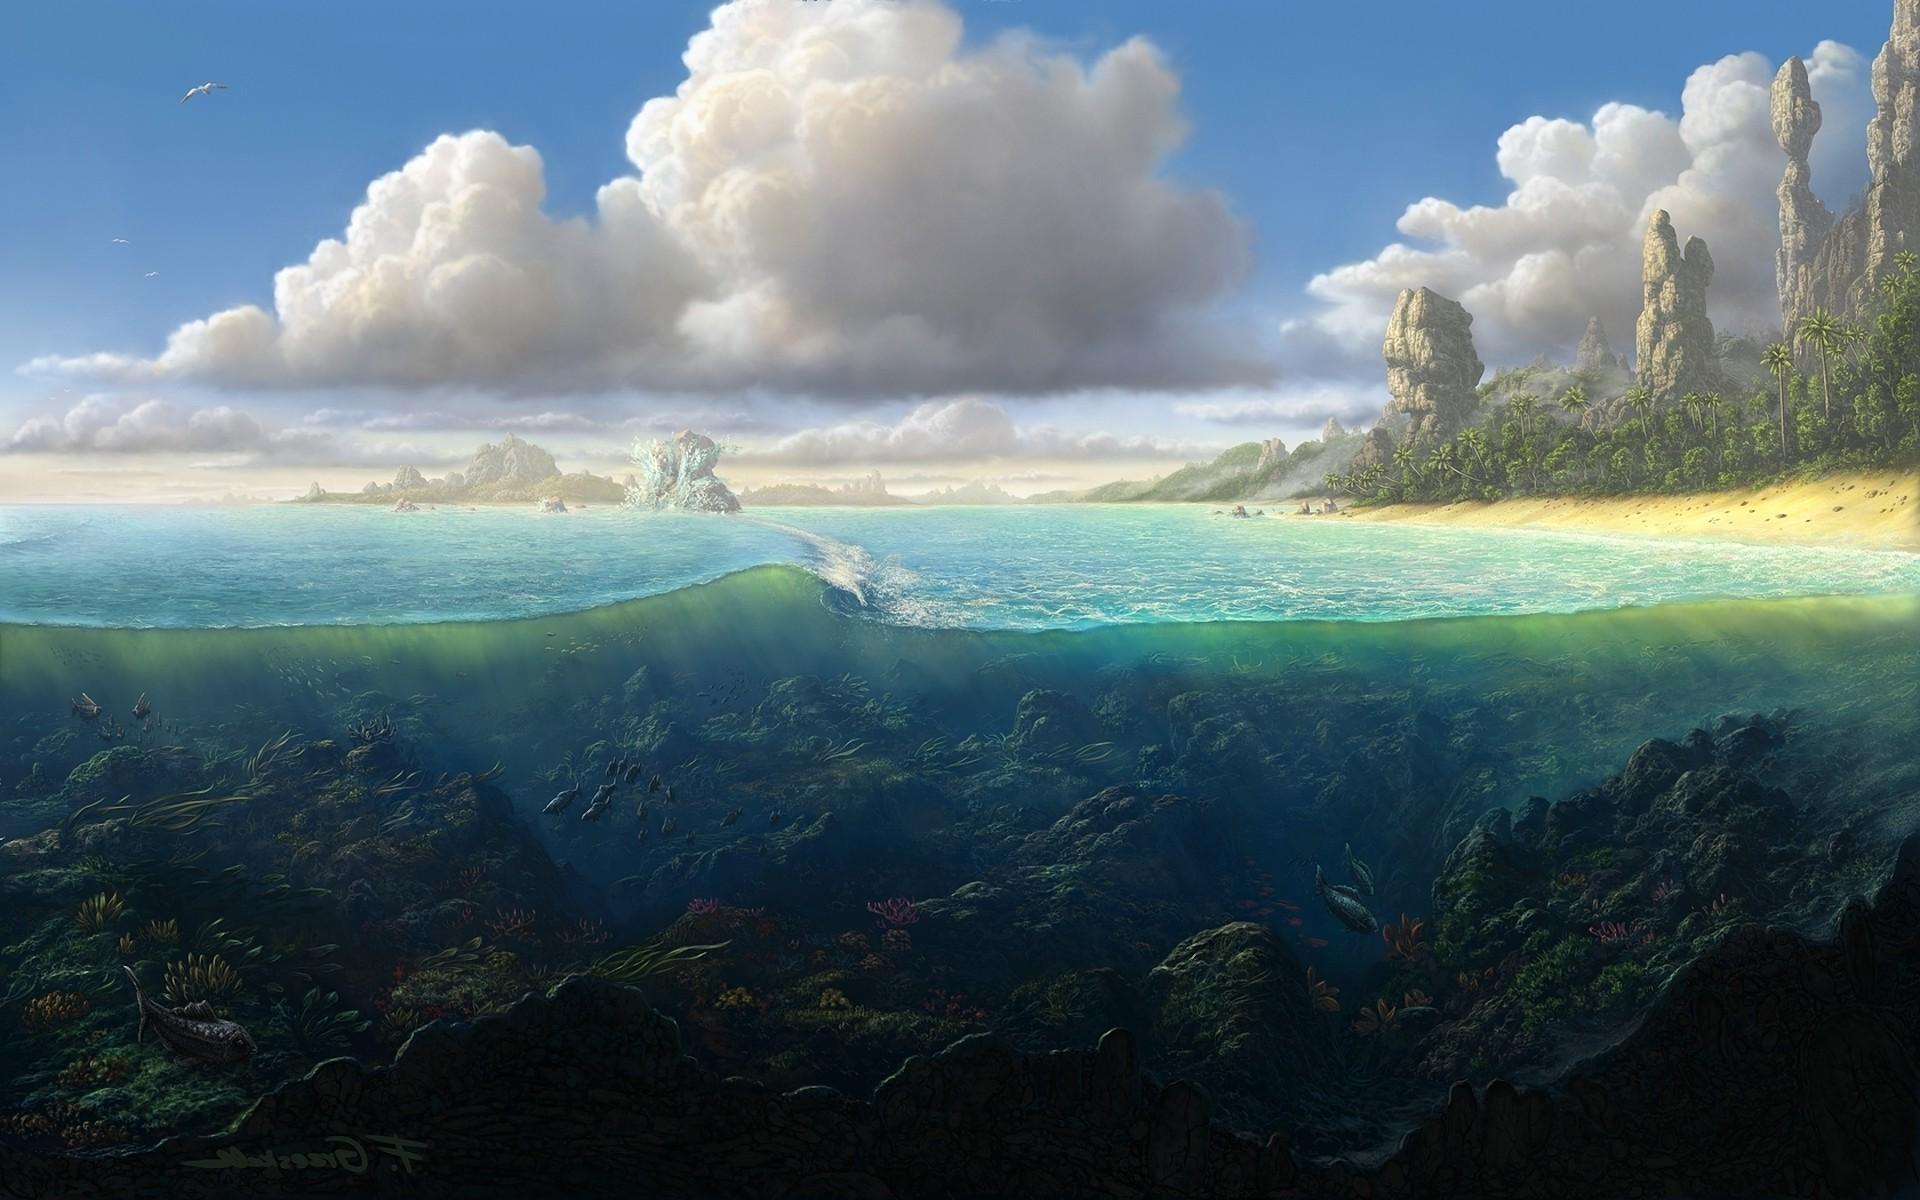 фэнтези картинки природа море милы тут